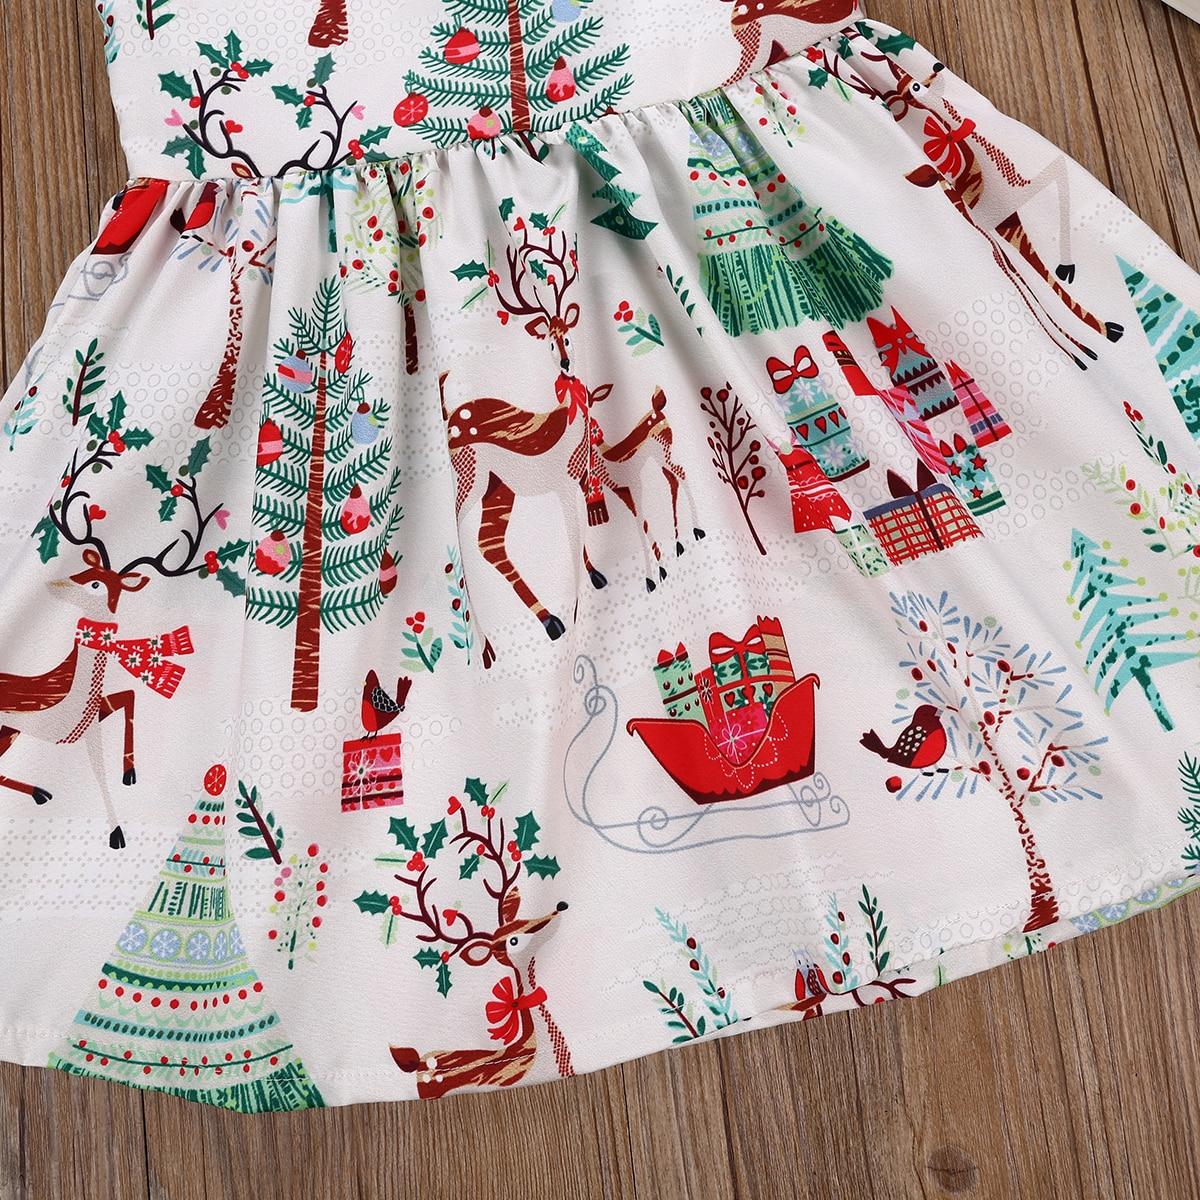 579954fcb 2-6 Years Xmas Toddler Kid Baby Girl Christmas Cartoon Deer Sleeveless  Party Dress 3